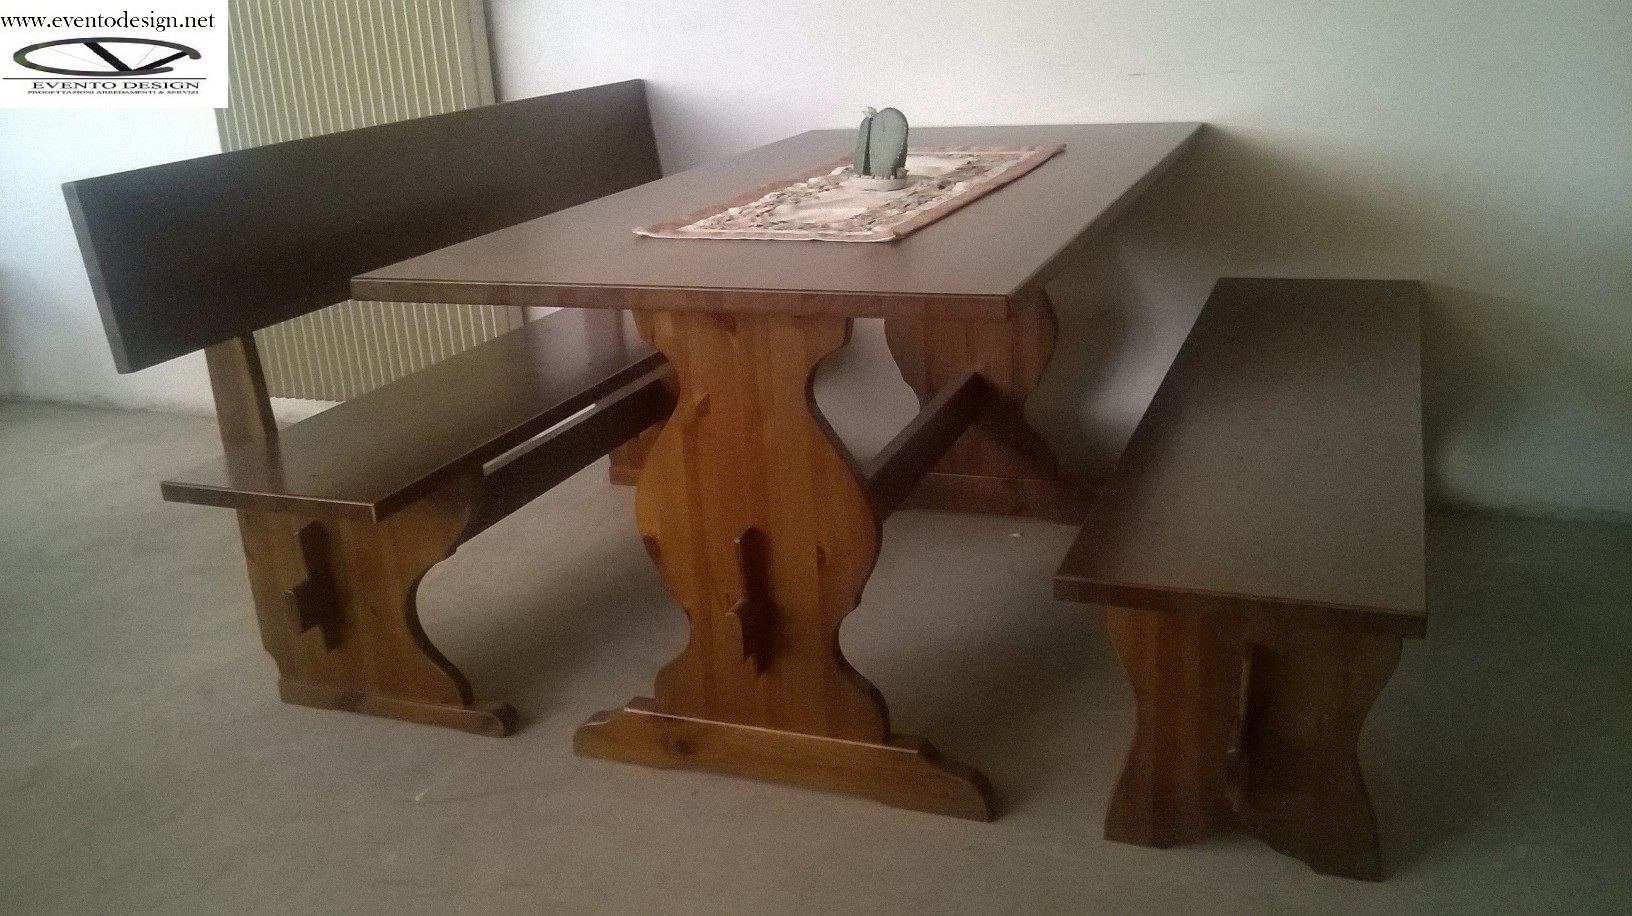 Tavoli Da Esterno Per Pub : Sedie metallo sedie legno sedie in plastica sedie in pelle sedie in